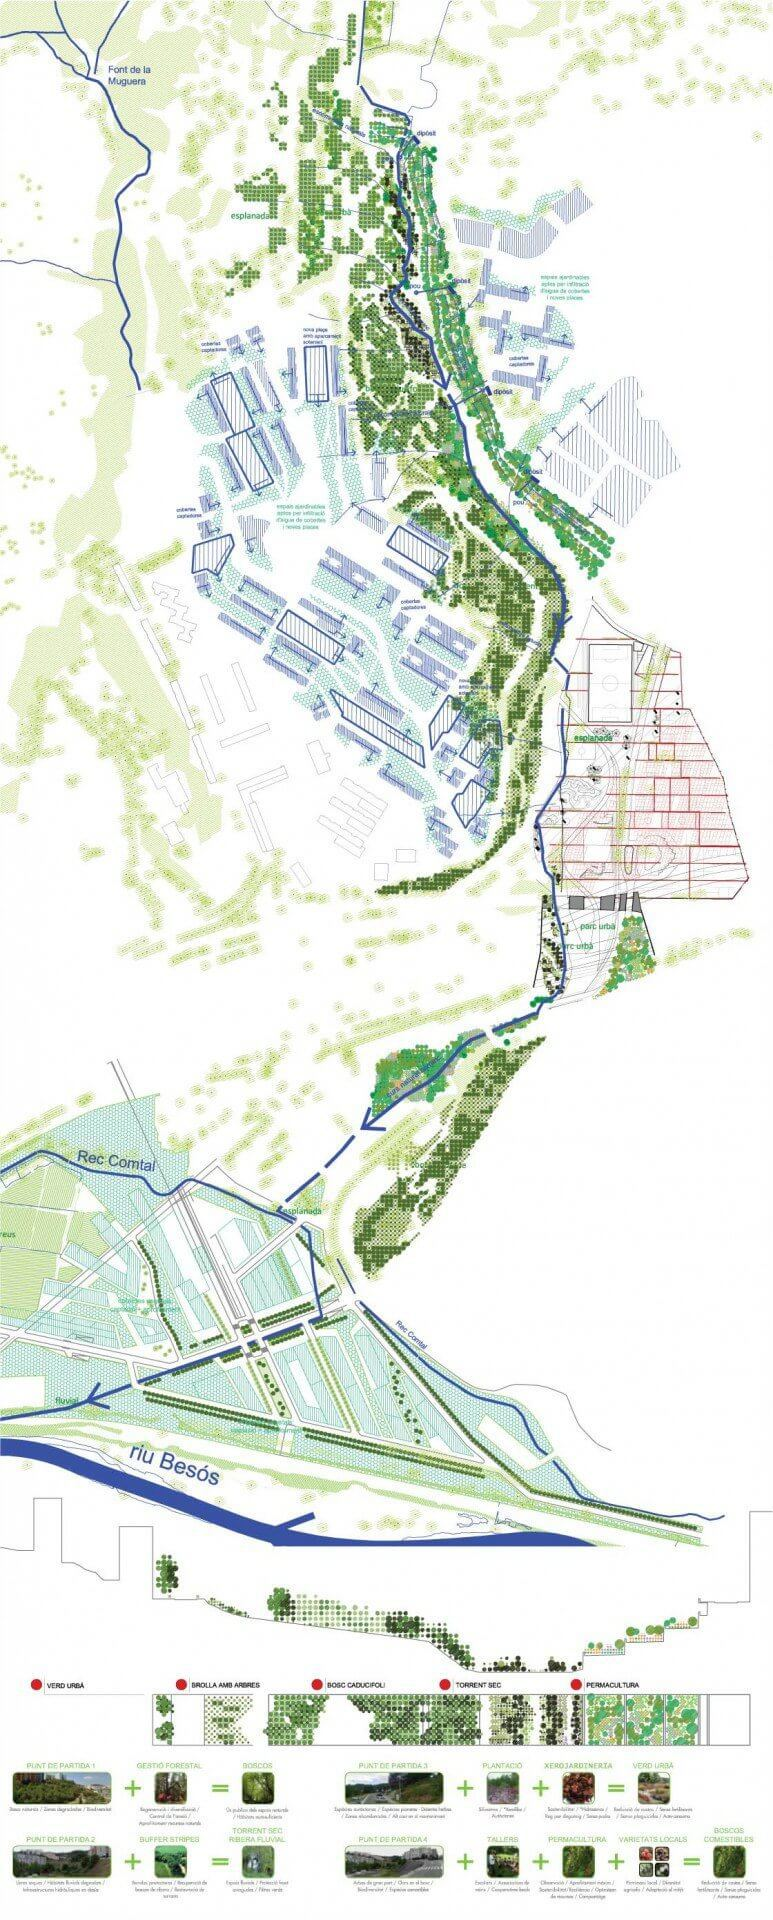 Cami de l'Aigua @Marc García-Durán, arquitecto